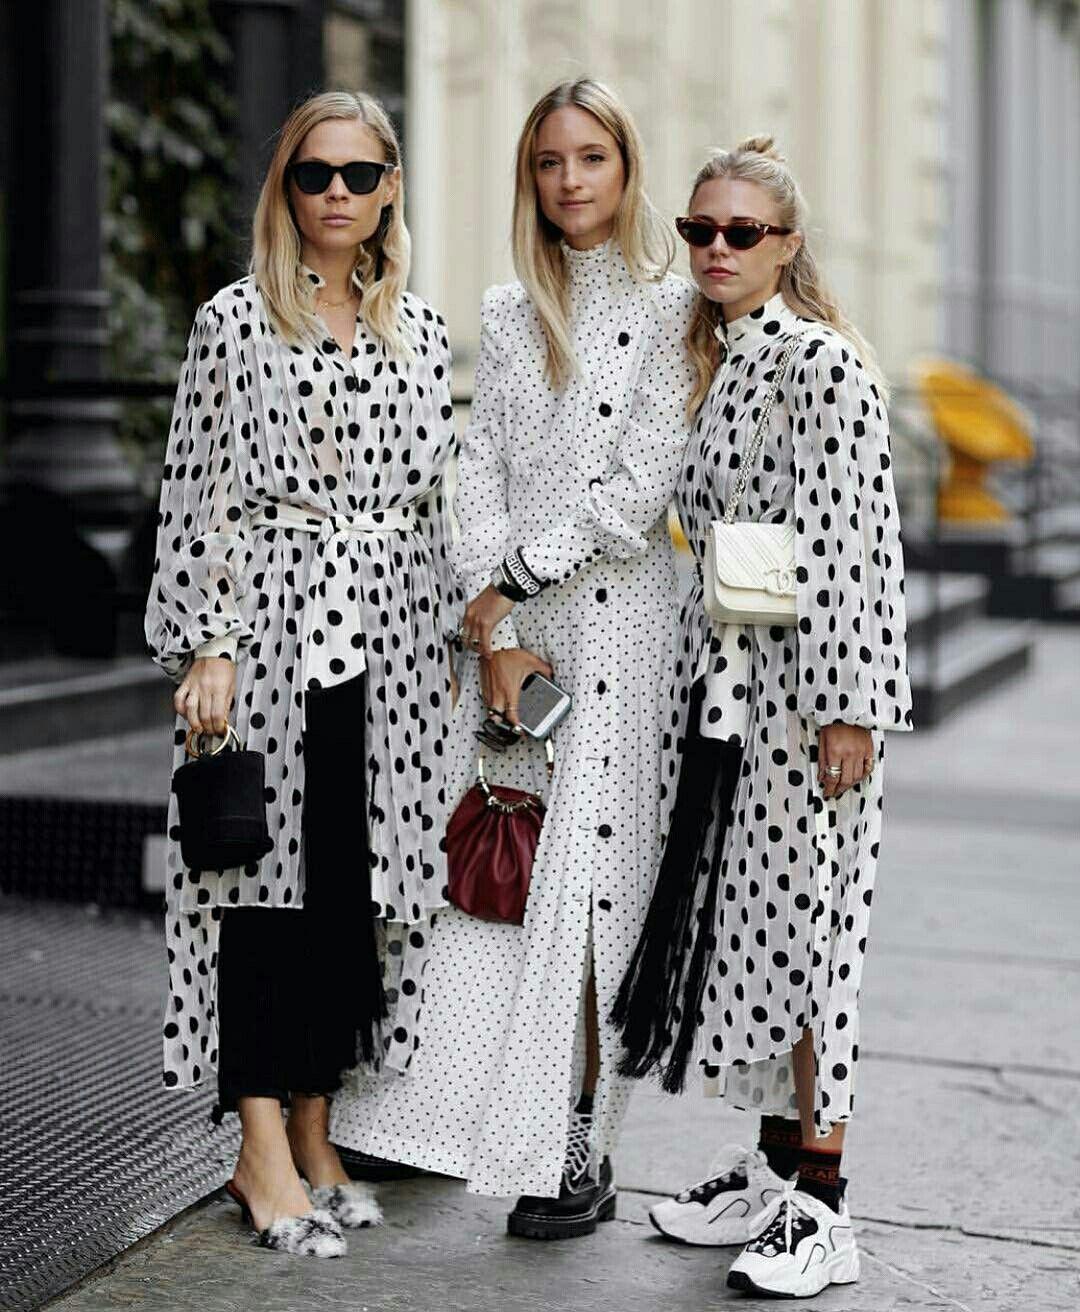 Resultado de imagem para polka dot street style